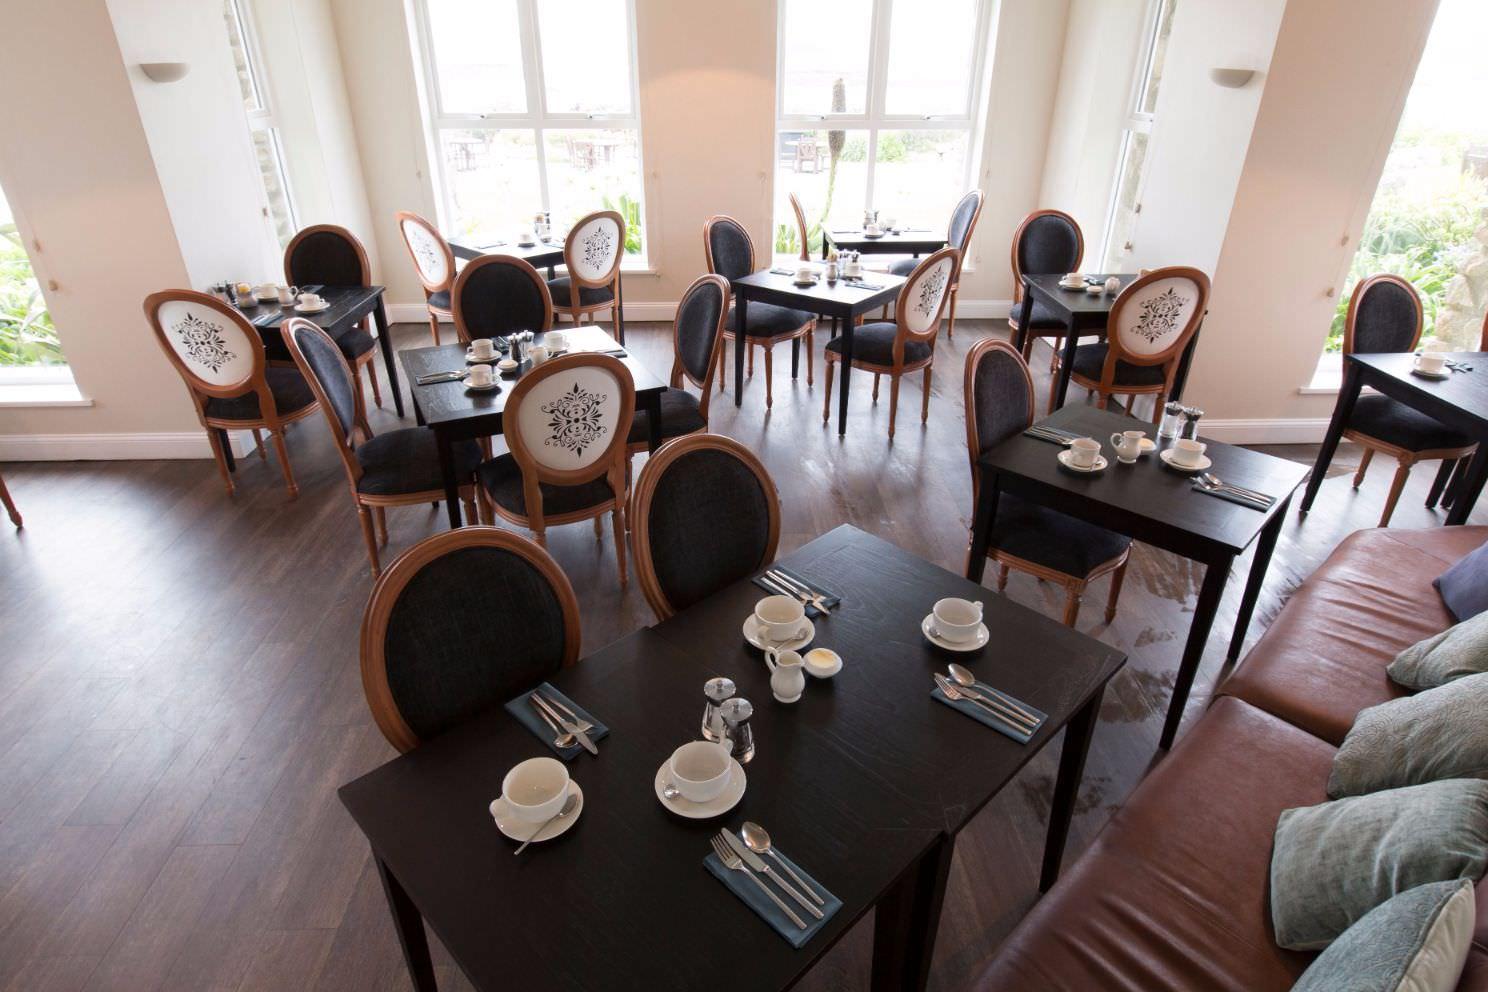 luxury hotel Karma St. Martin Cloudesley Shovell Restaurant